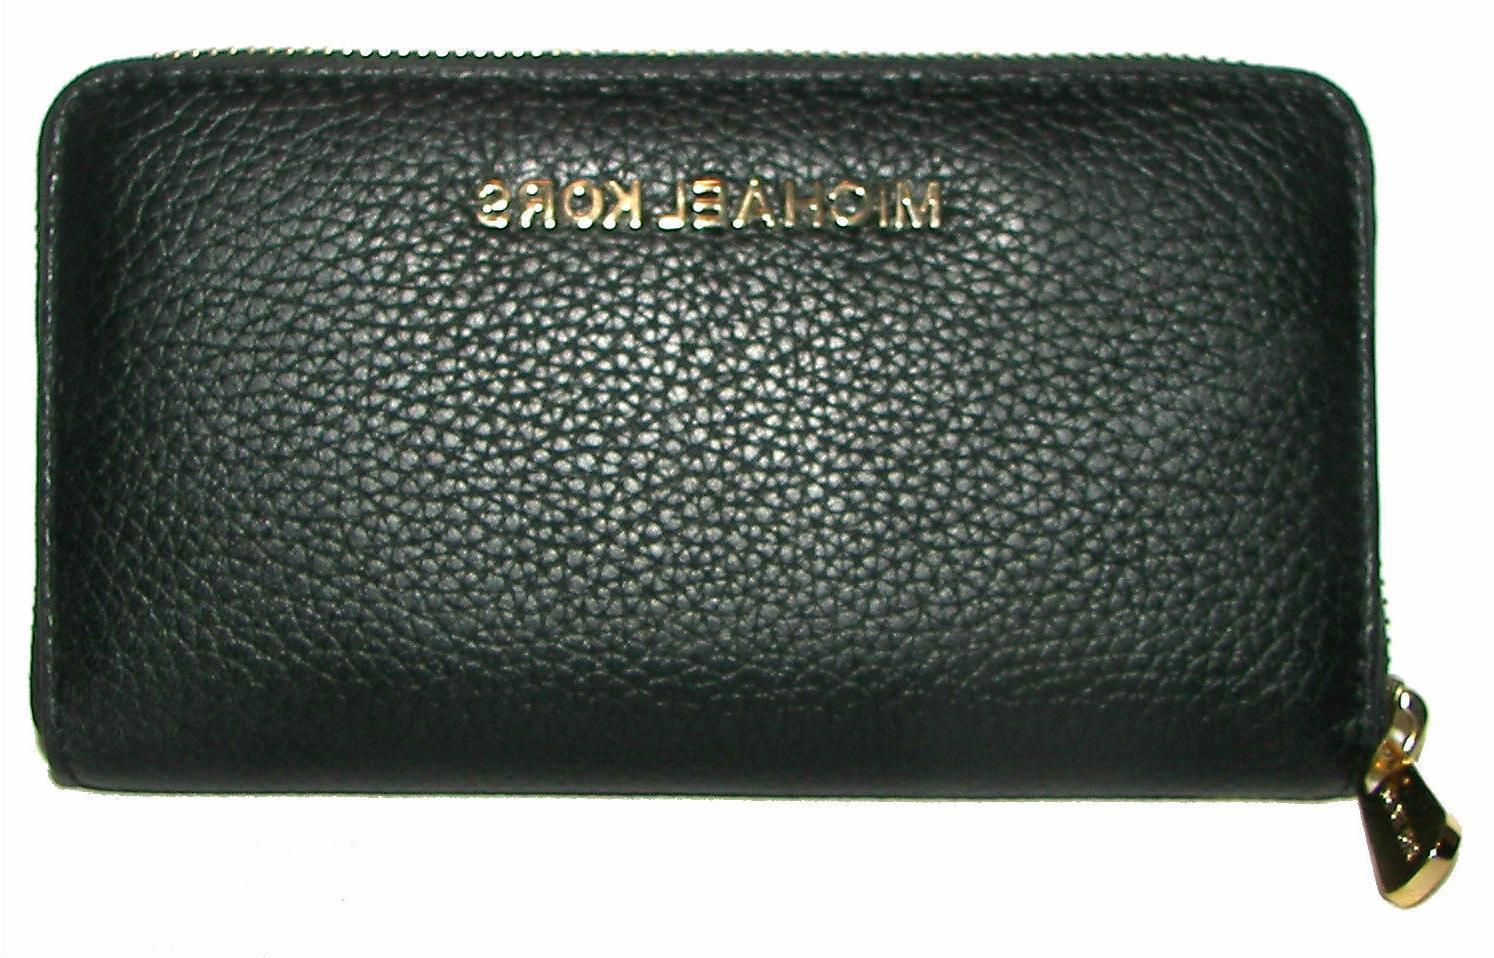 black leather tech zip around clutch wallet